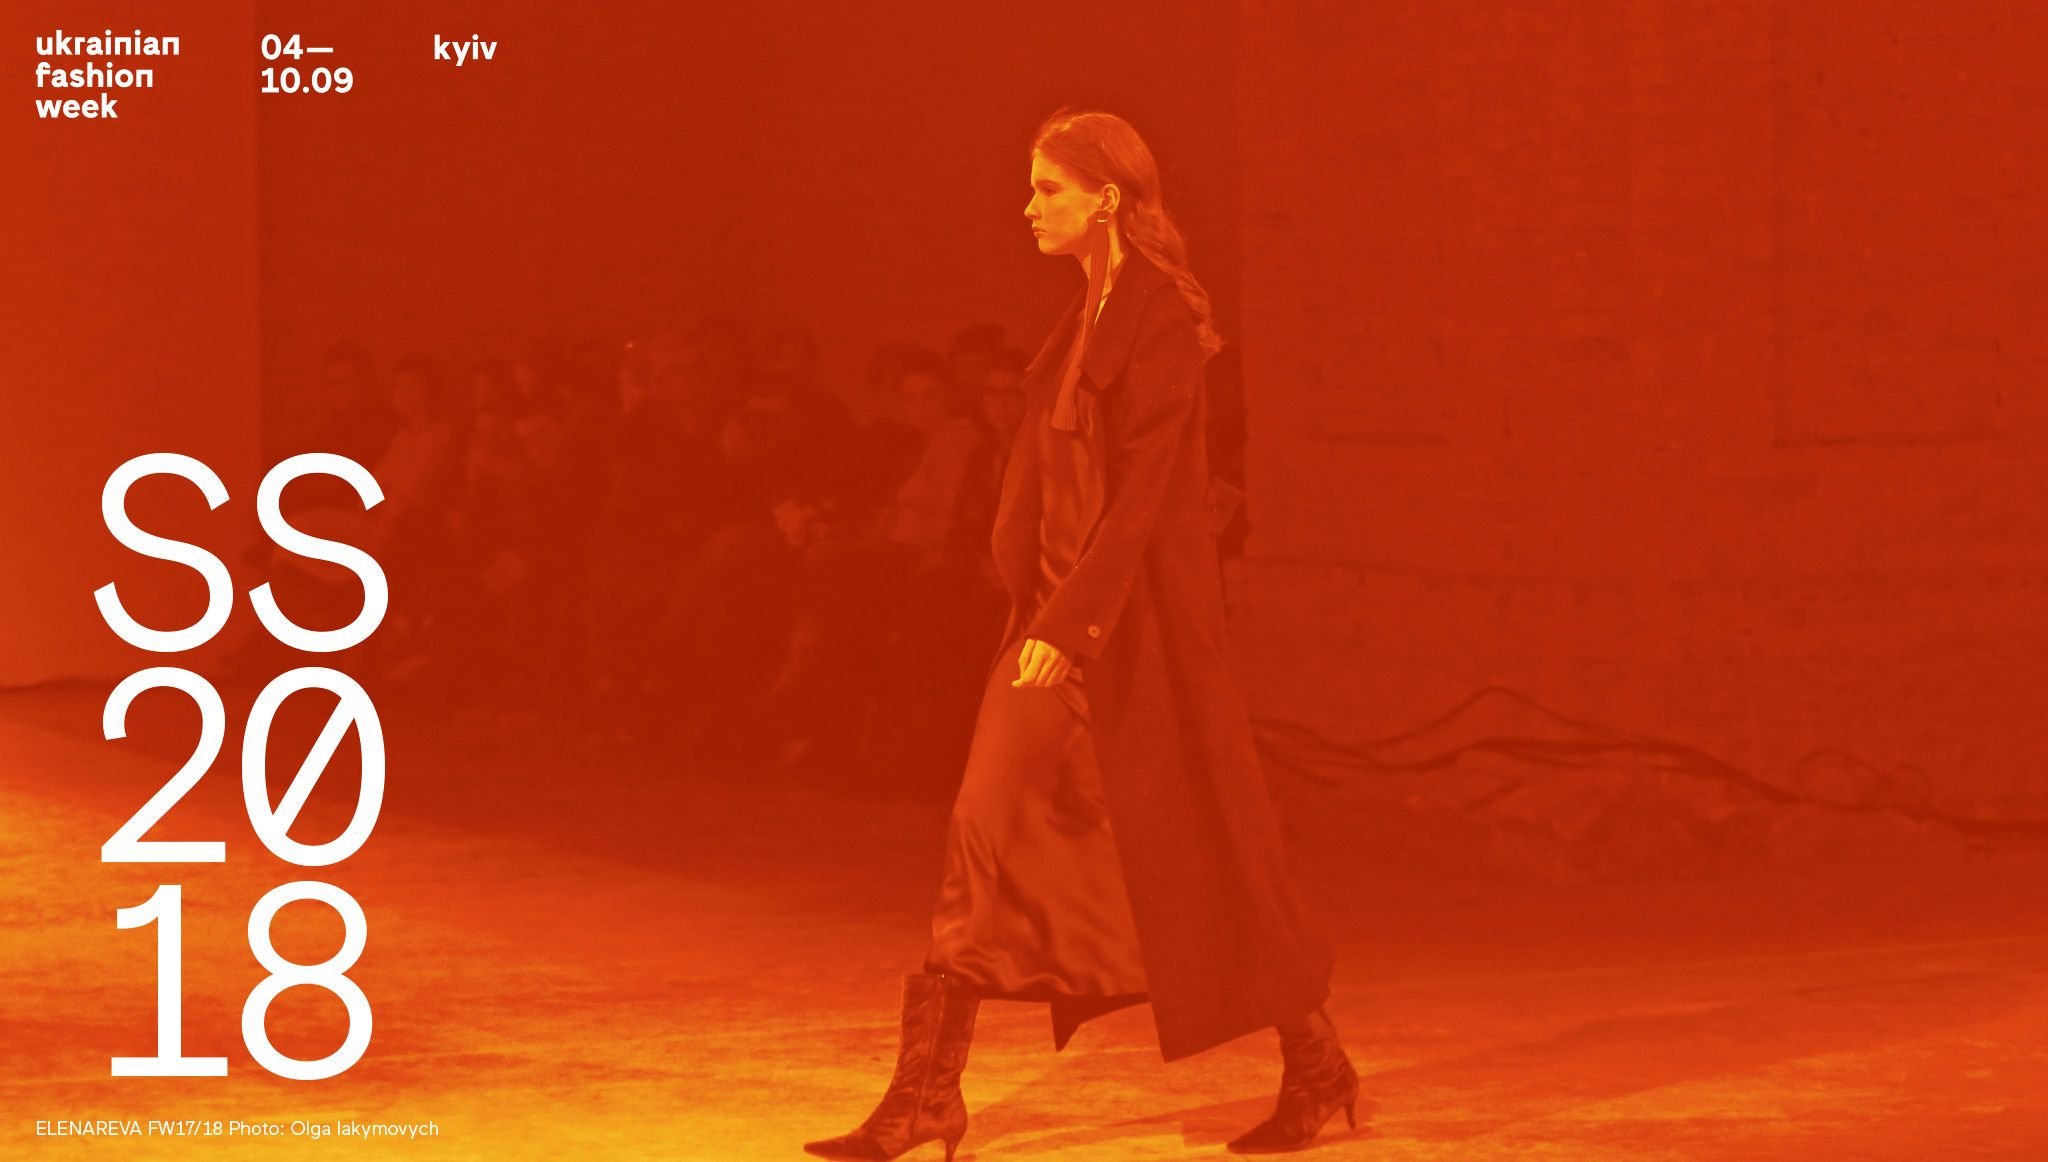 Ukrainian Fashion Week SS18